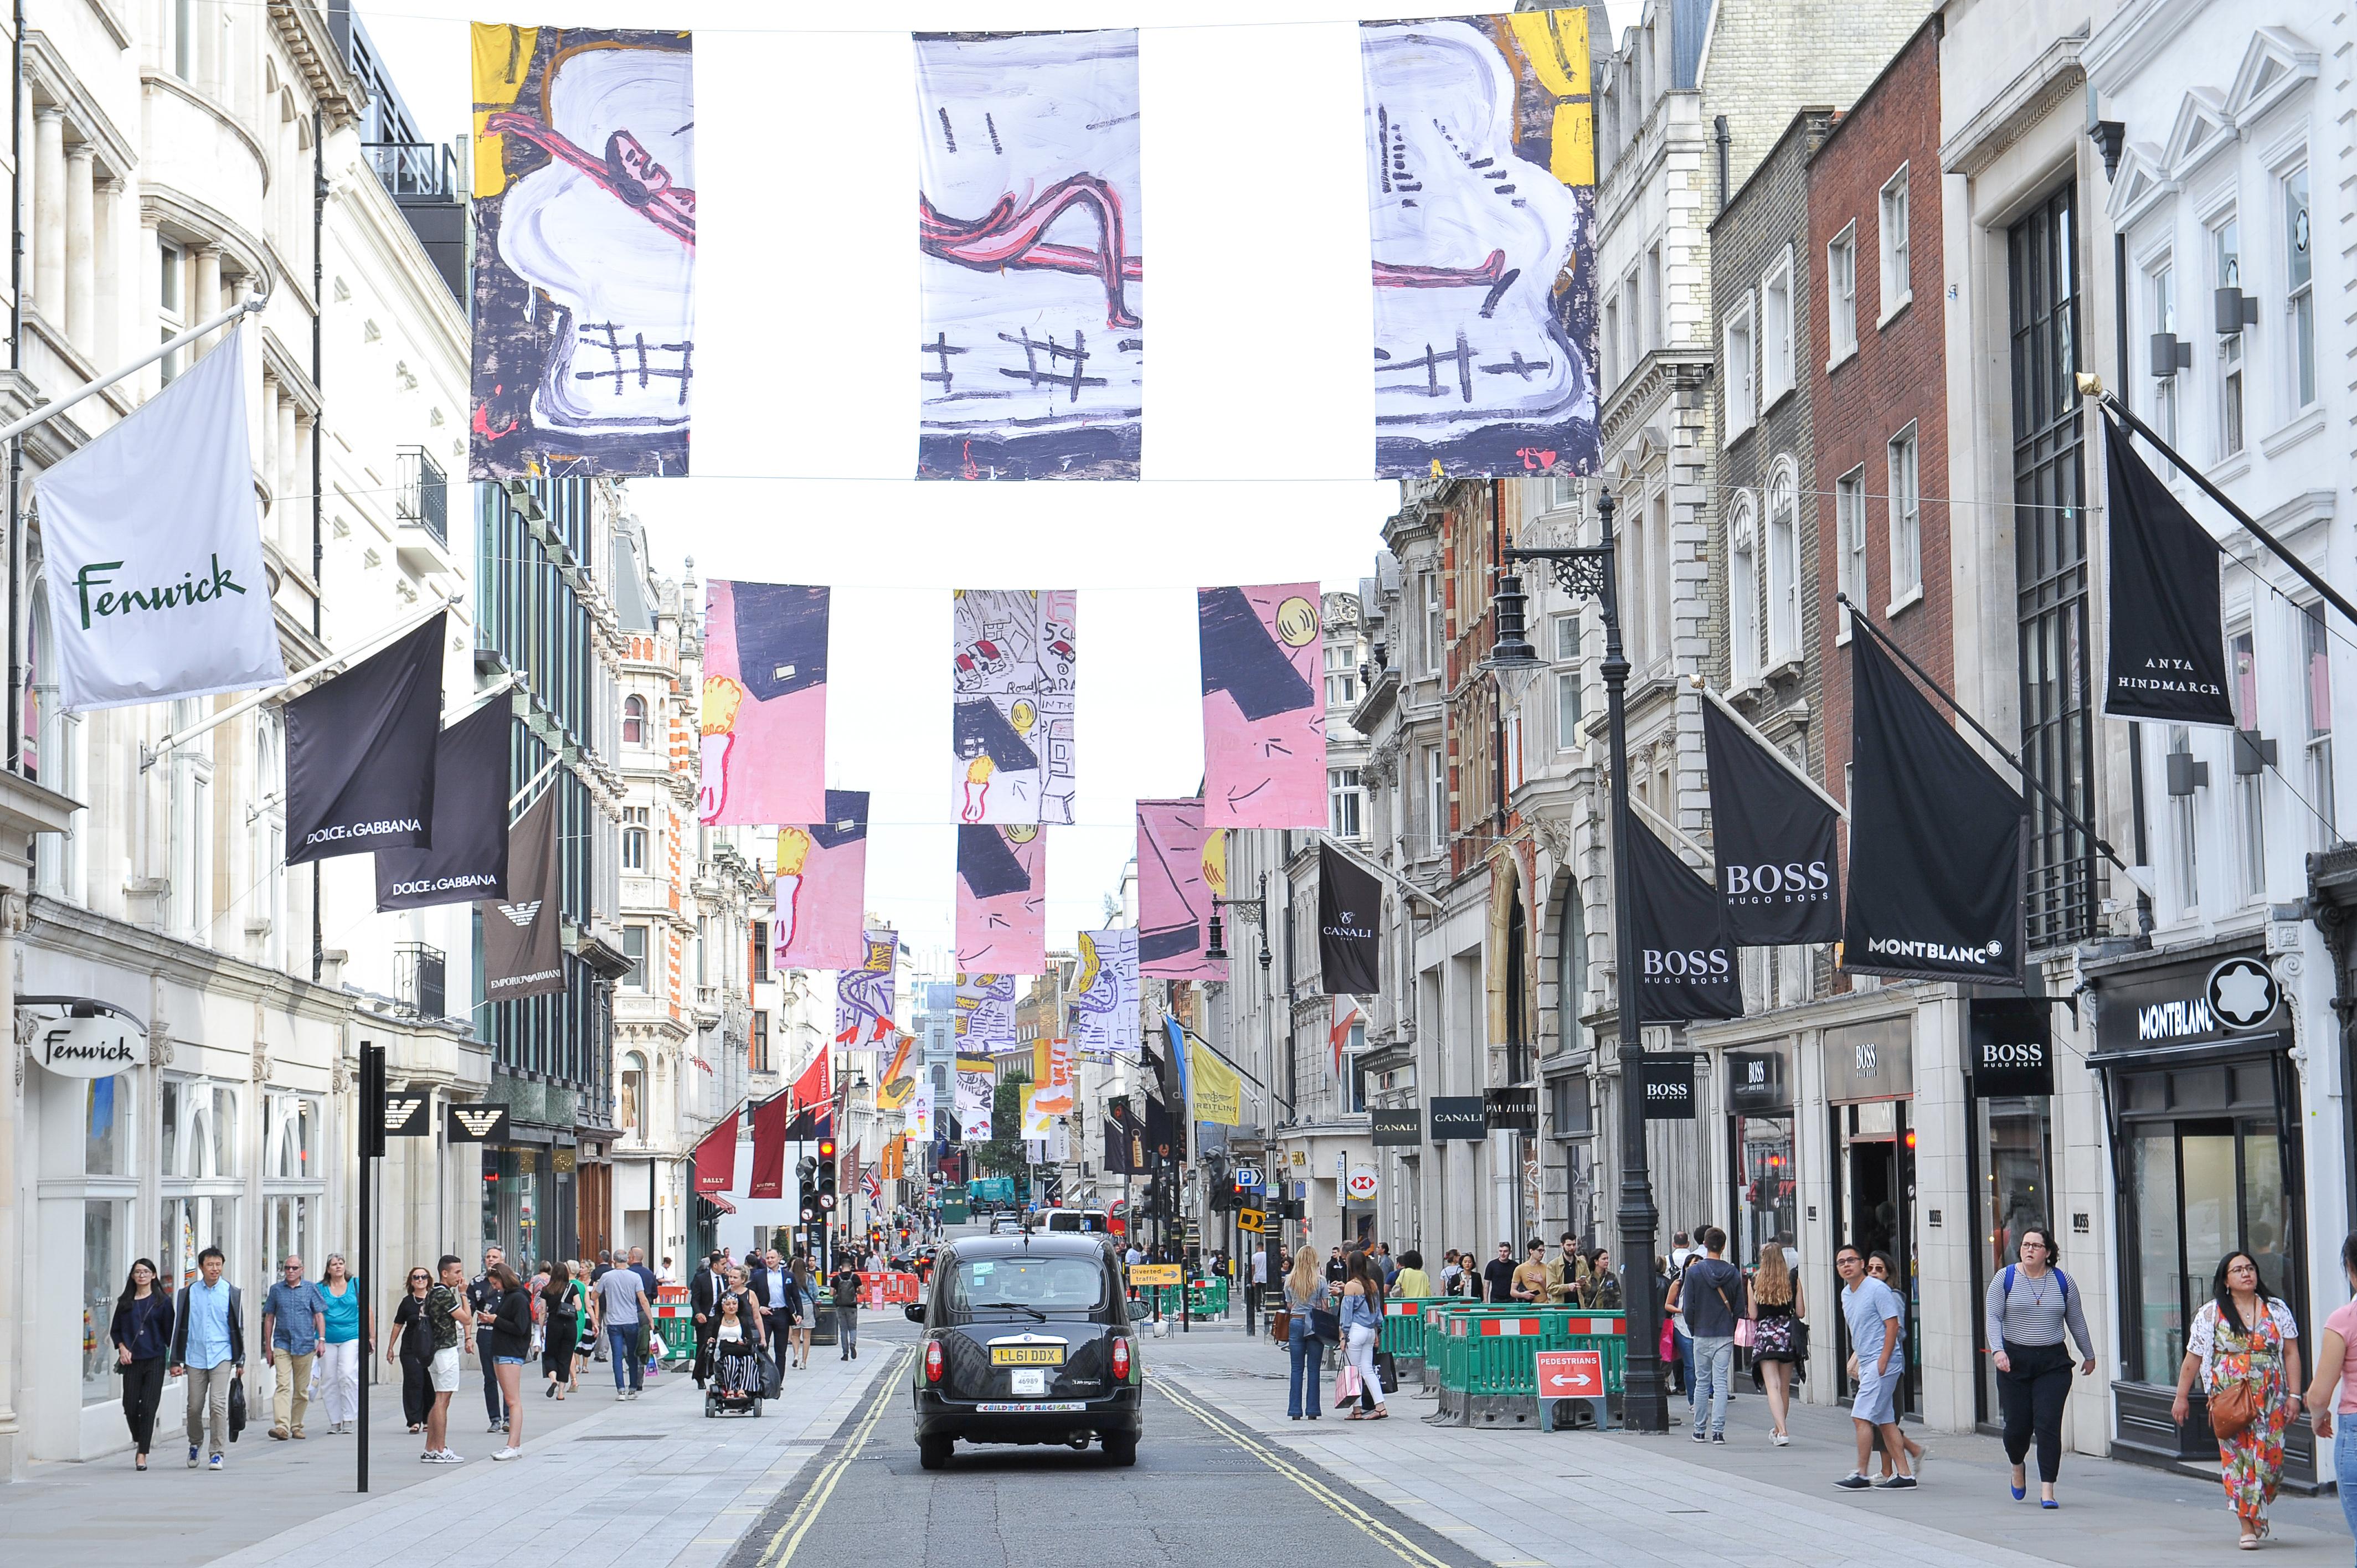 Retailers on New Bond Street